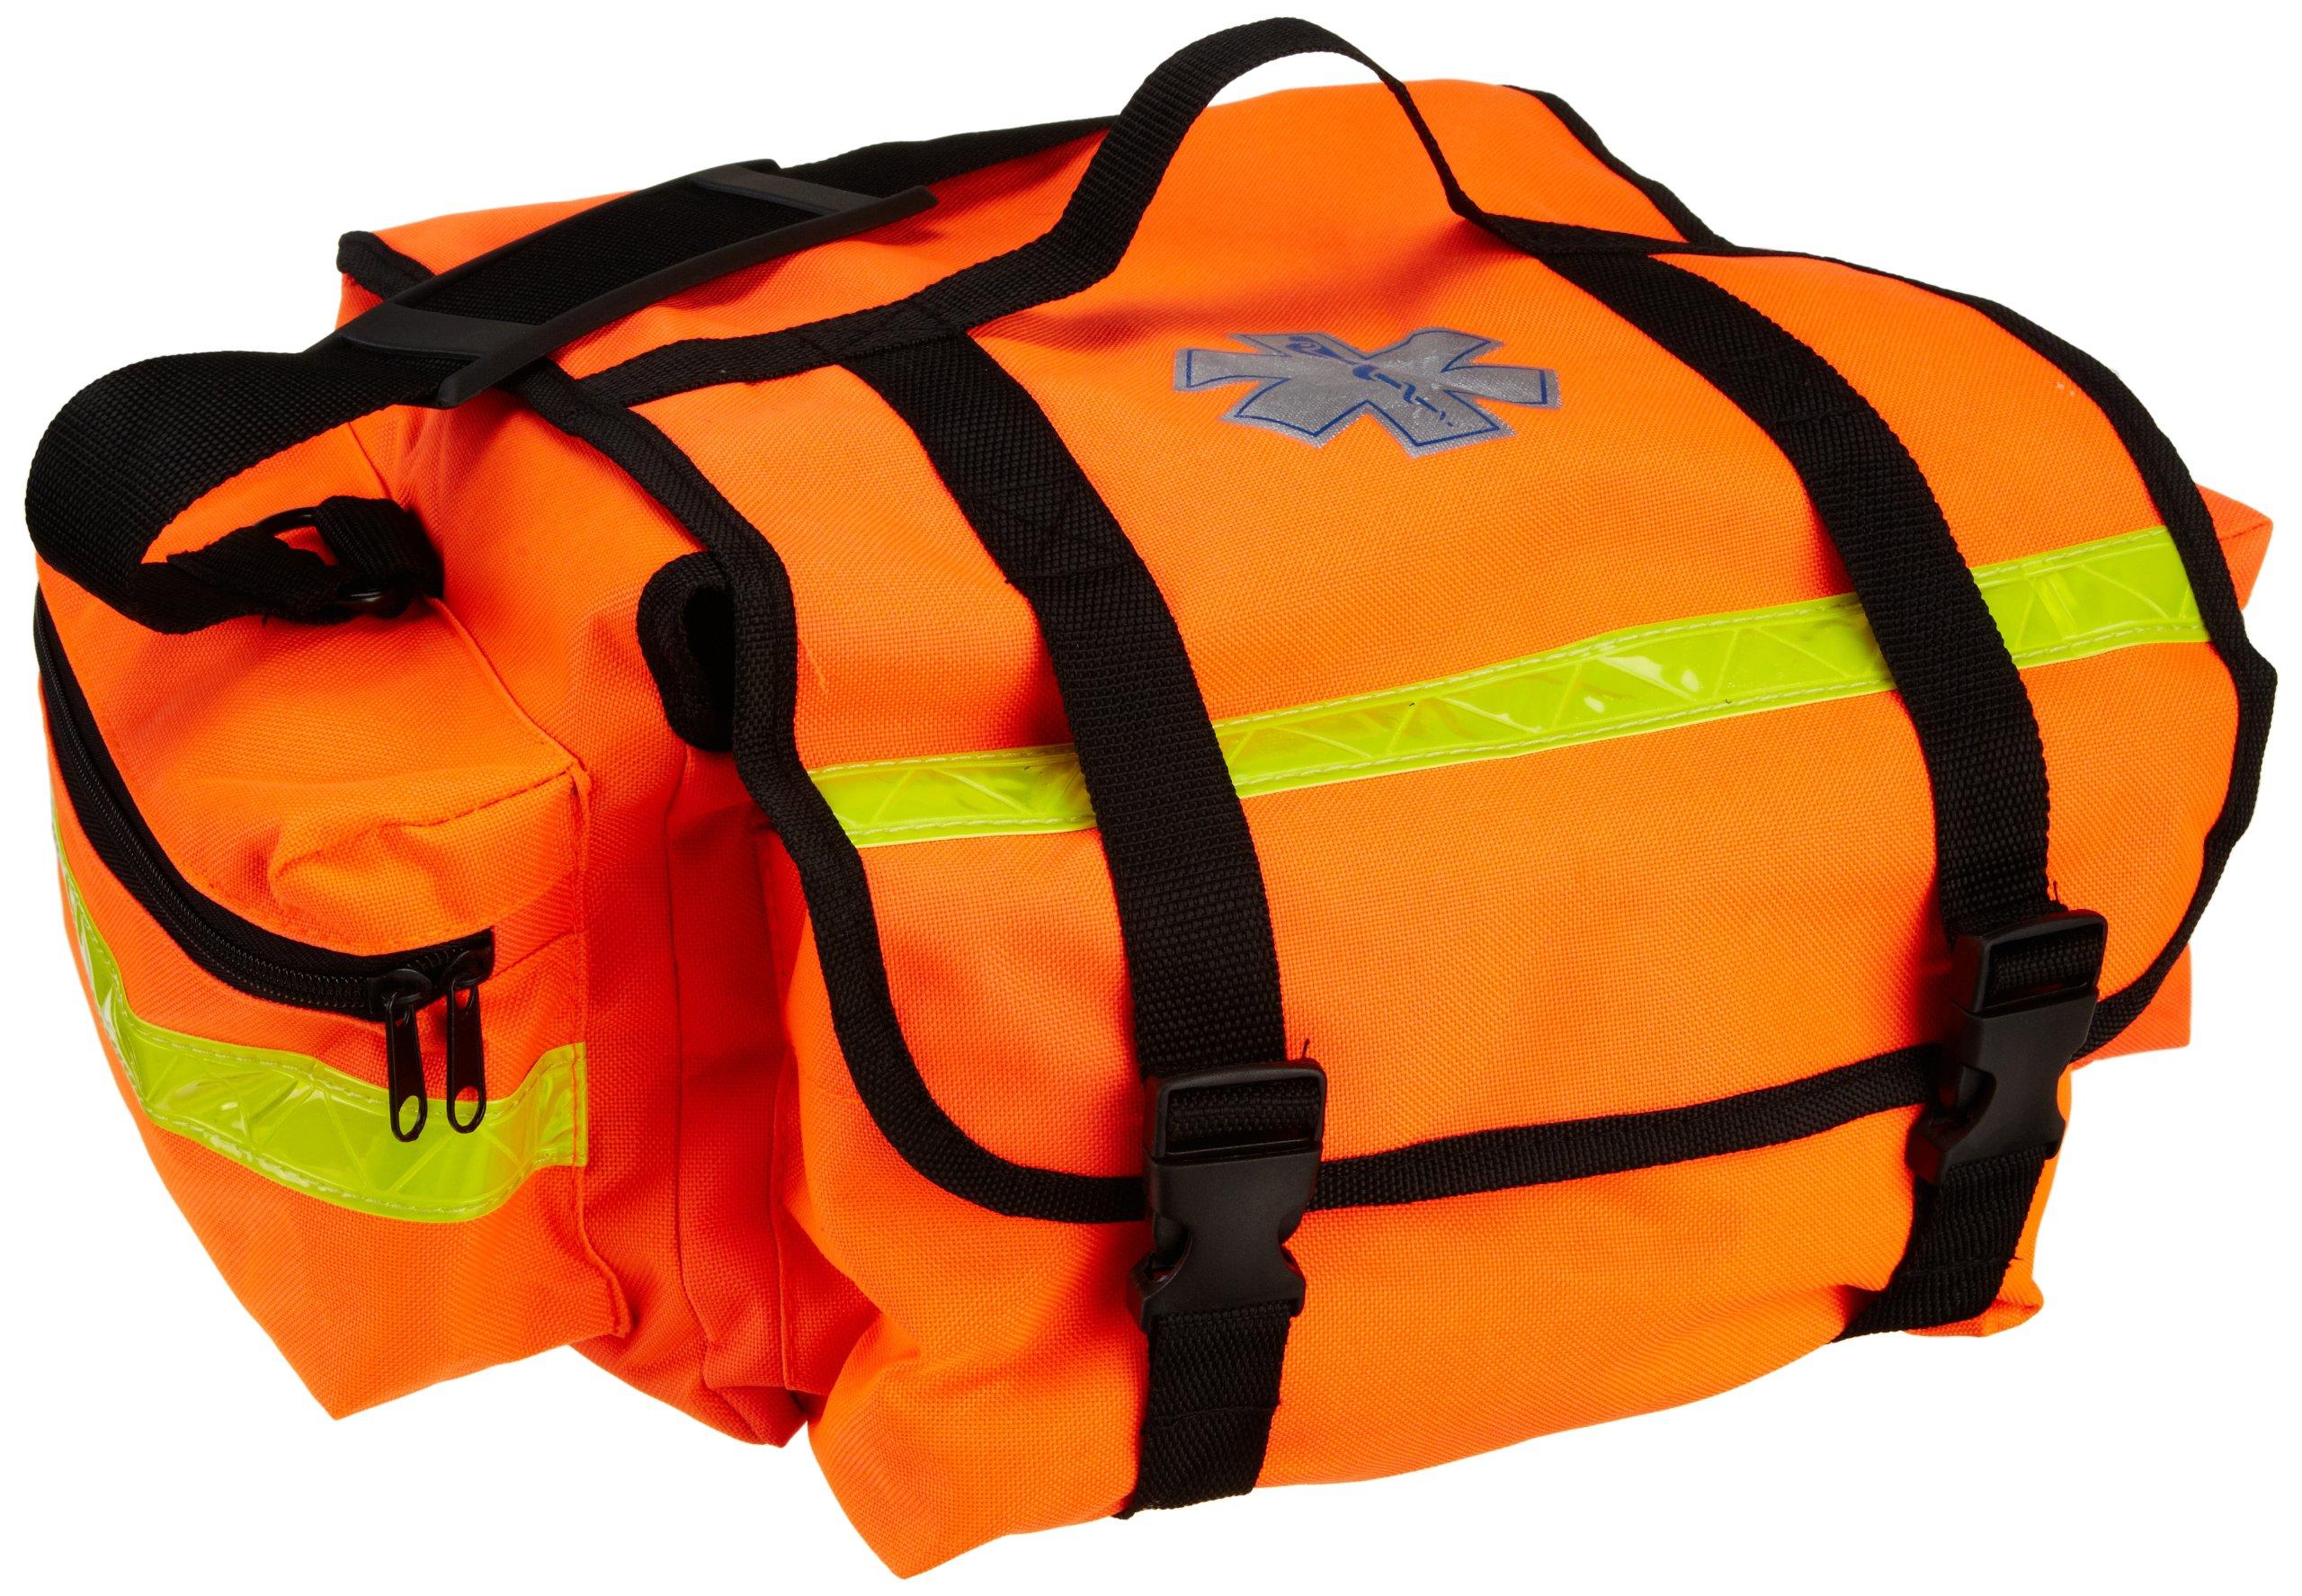 Primacare KB-RO74-O Trauma Bag, 7'' Height x 17'' Width x 9'' Depth, Orange